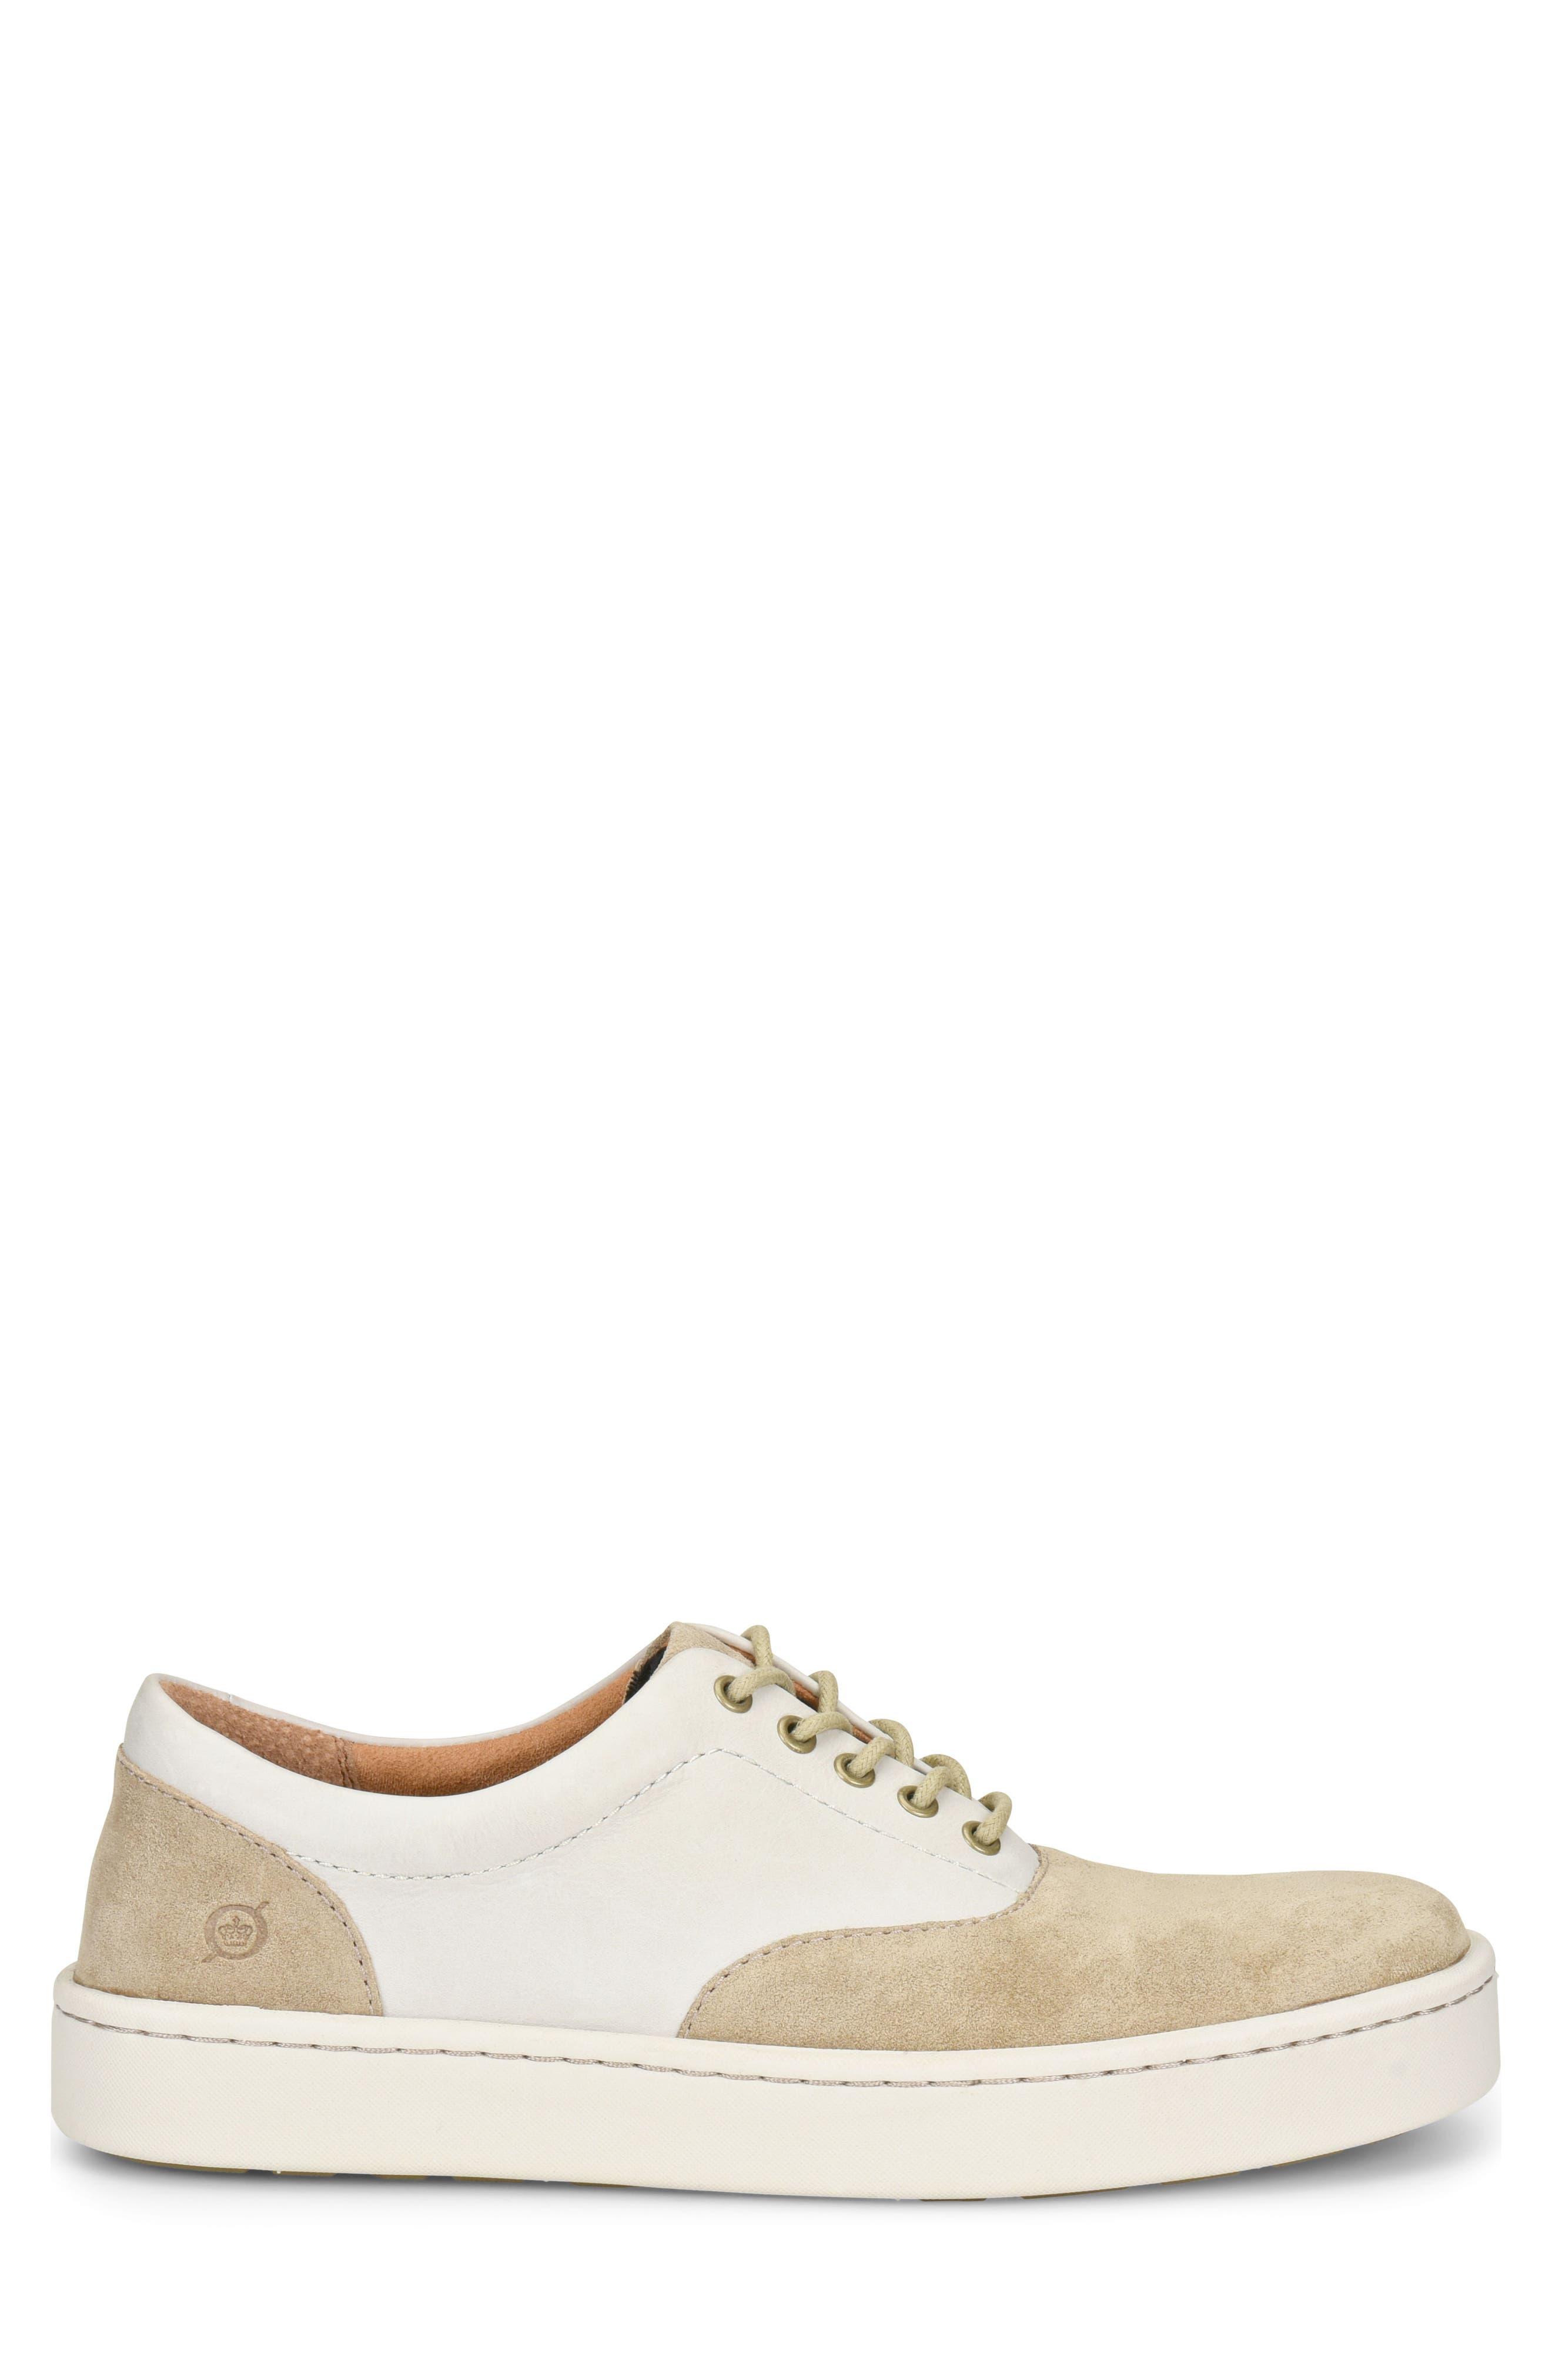 Keystone Low Top Sneaker,                             Alternate thumbnail 9, color,